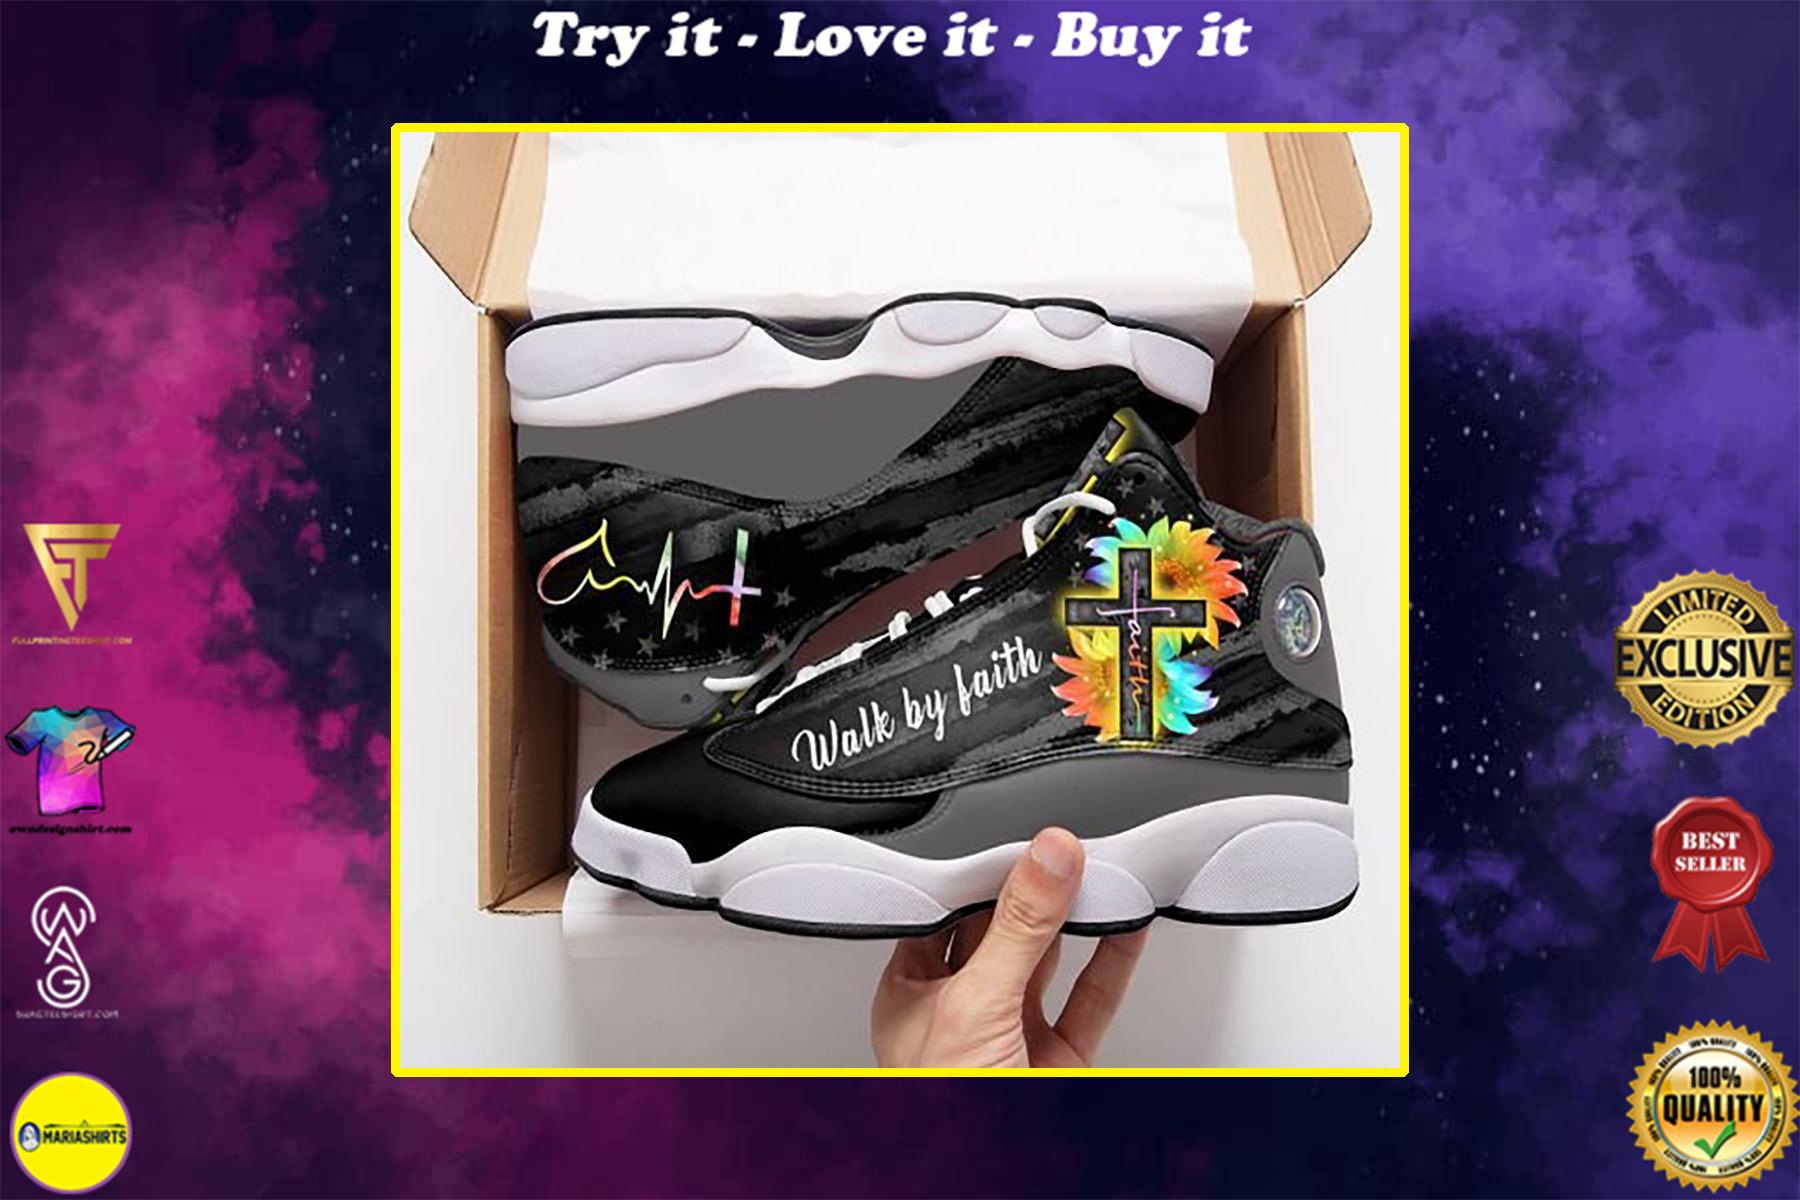 faith hope love walk by faith air jordan 13 sneakers